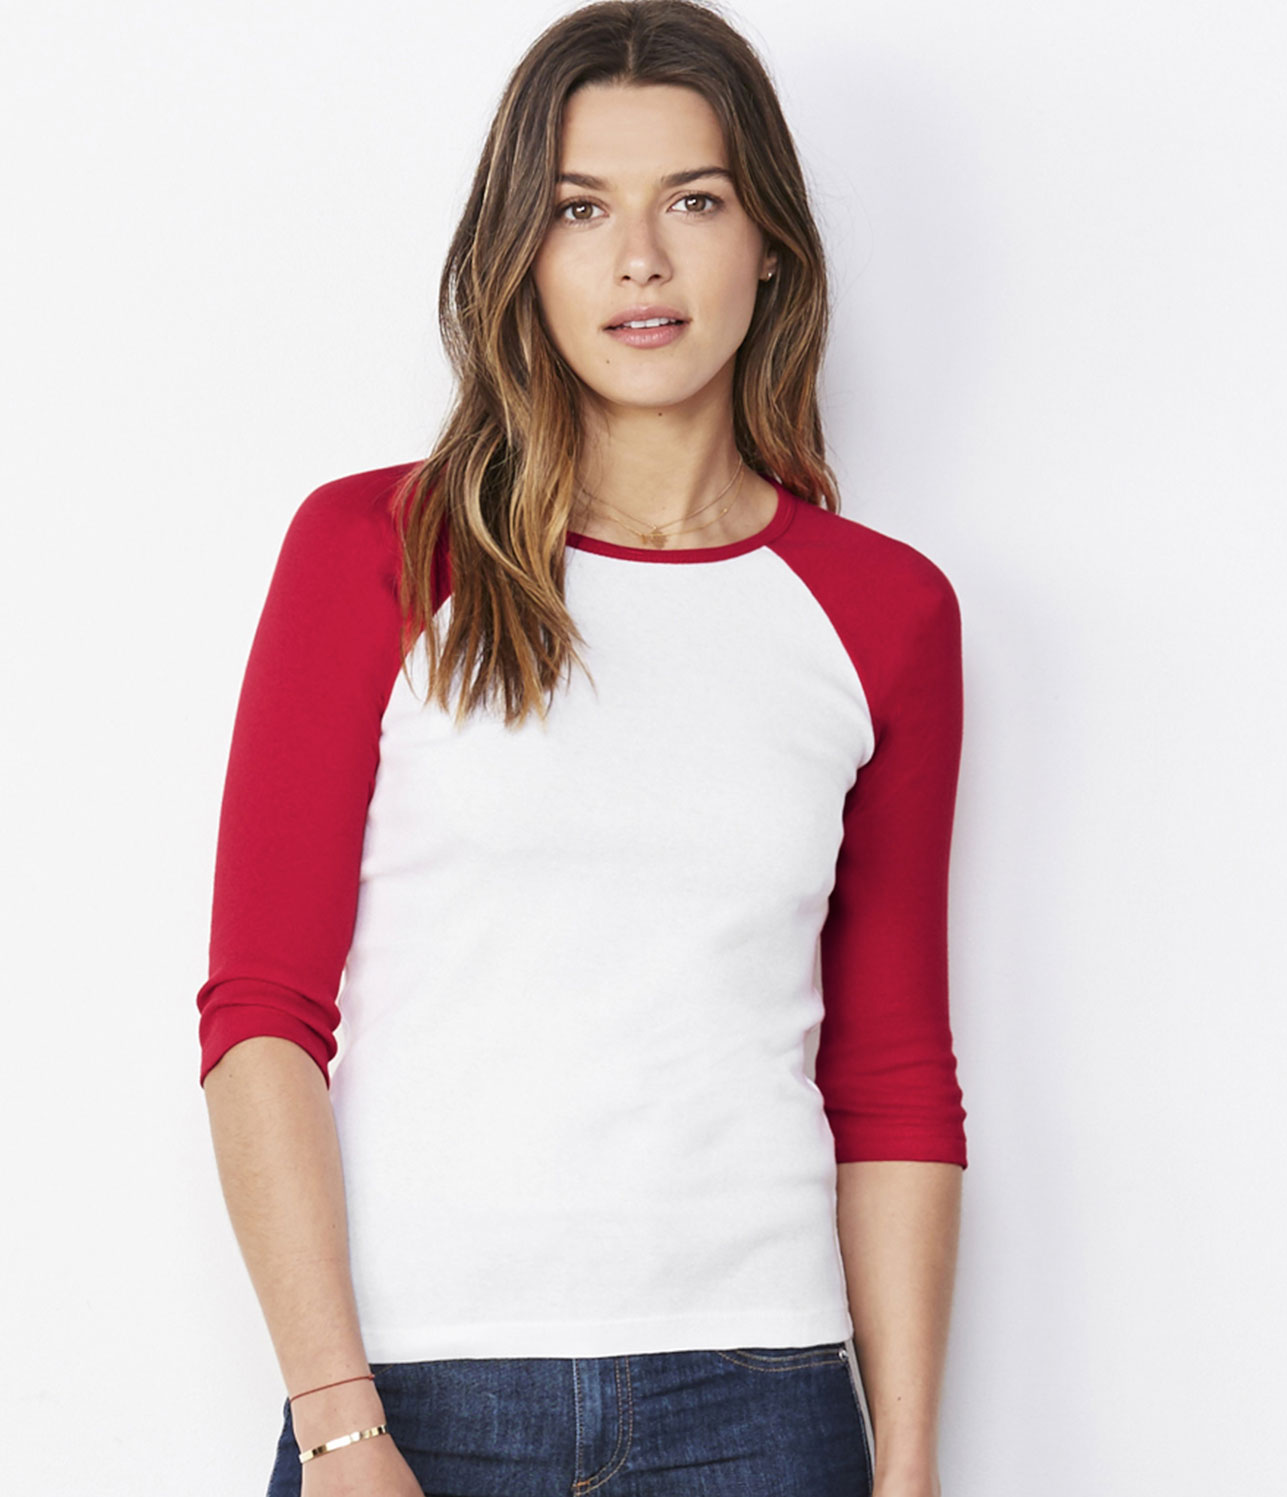 Bella Canvas 3/4 sleeve baseball t-shirt